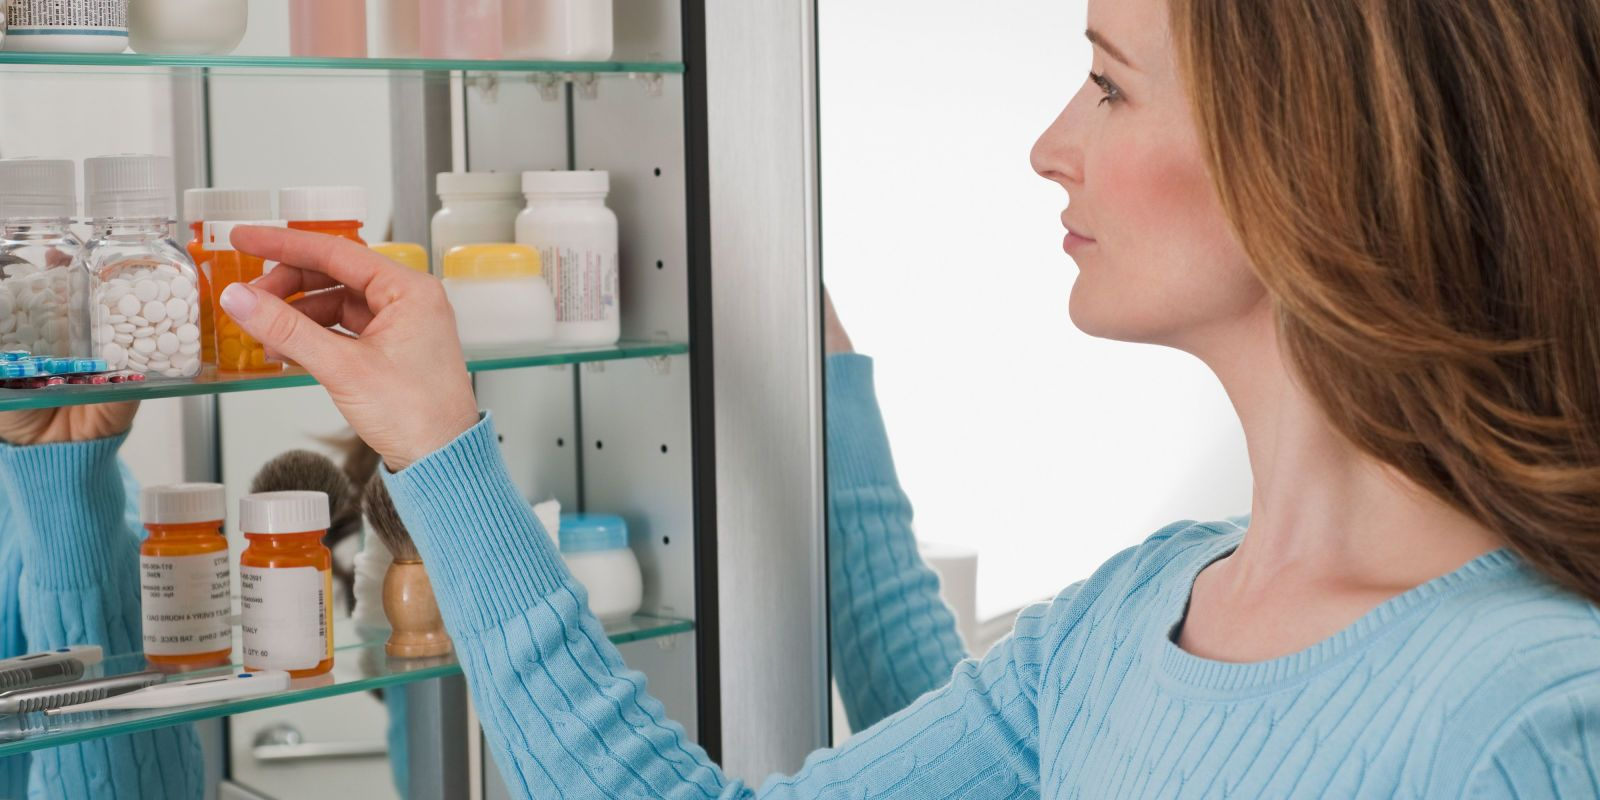 жженщина берет таблетки из шкафчика с лекарствами